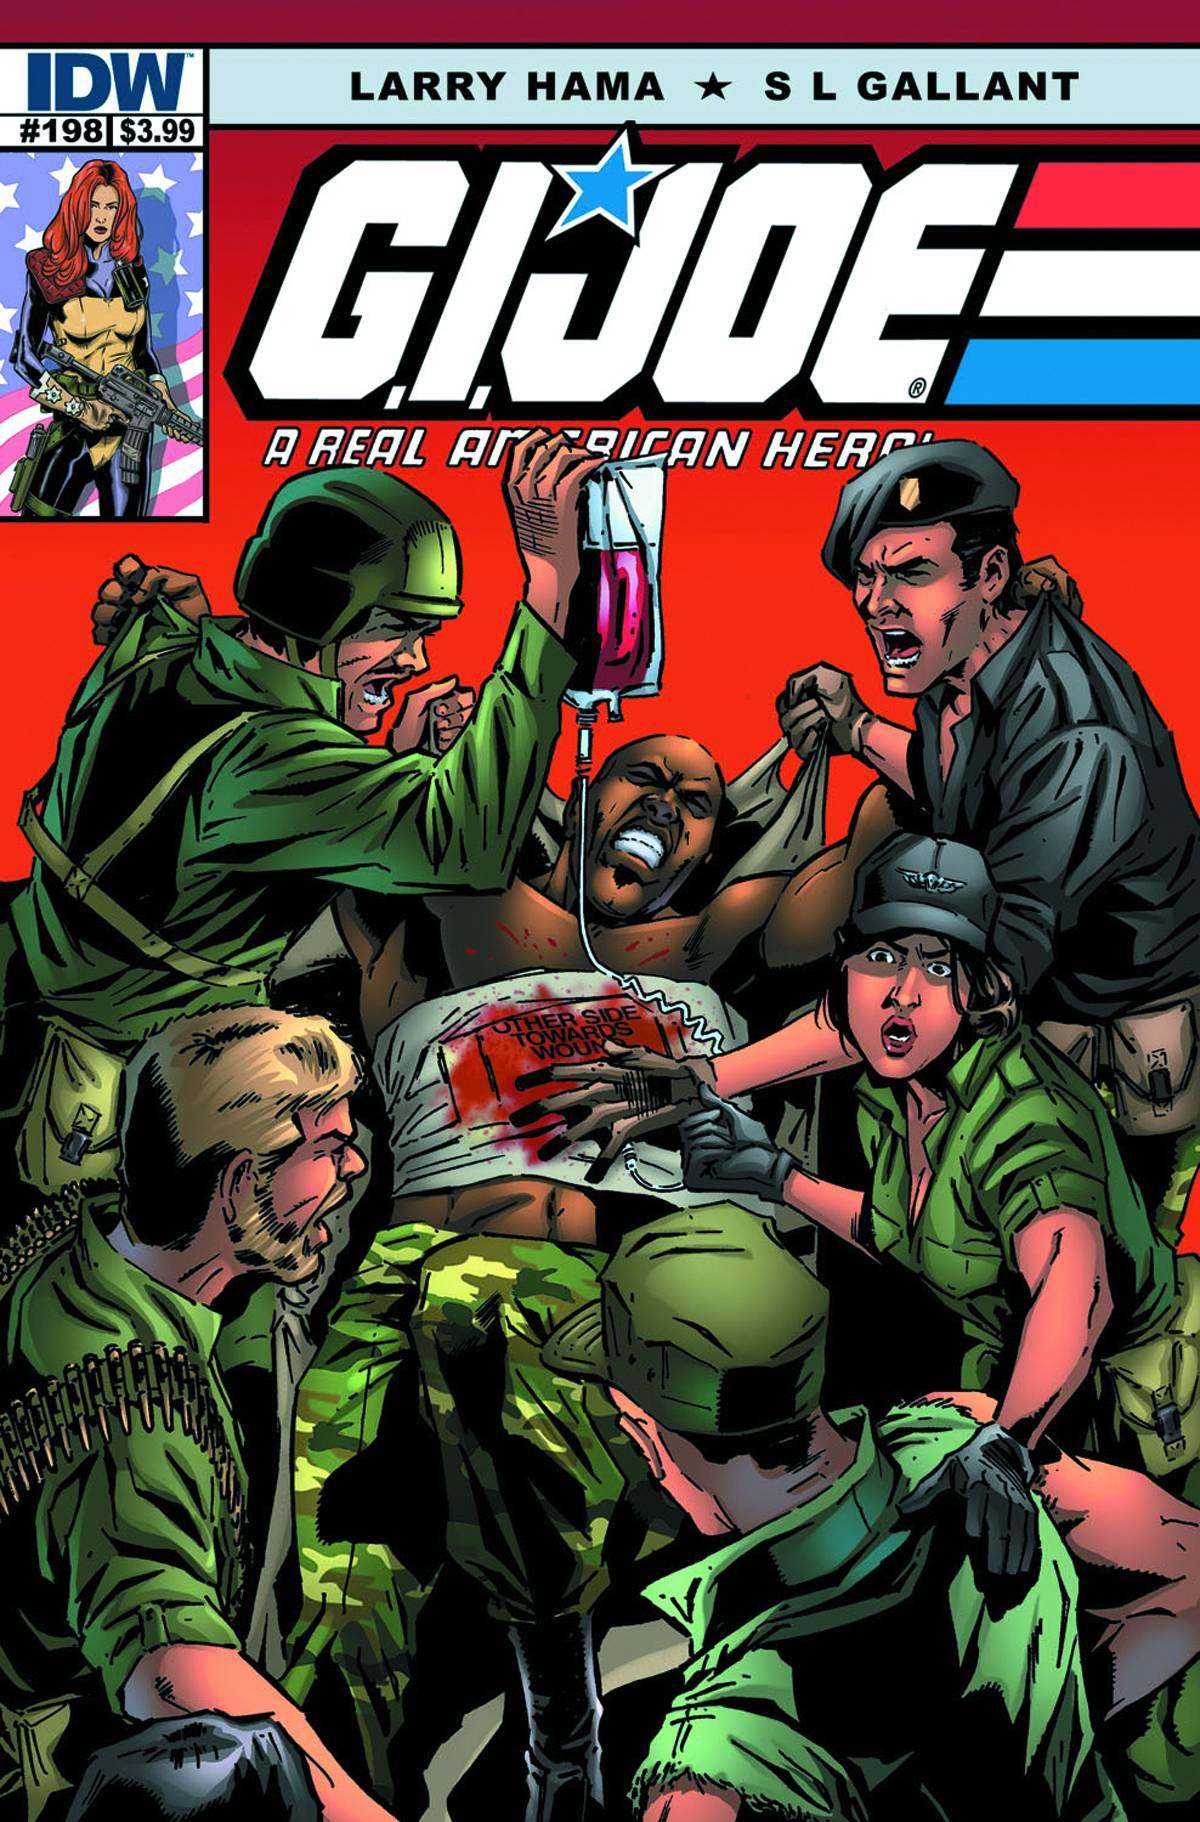 IDW G.I.Joe A Real American Hero #198 Preview - HissTank.com